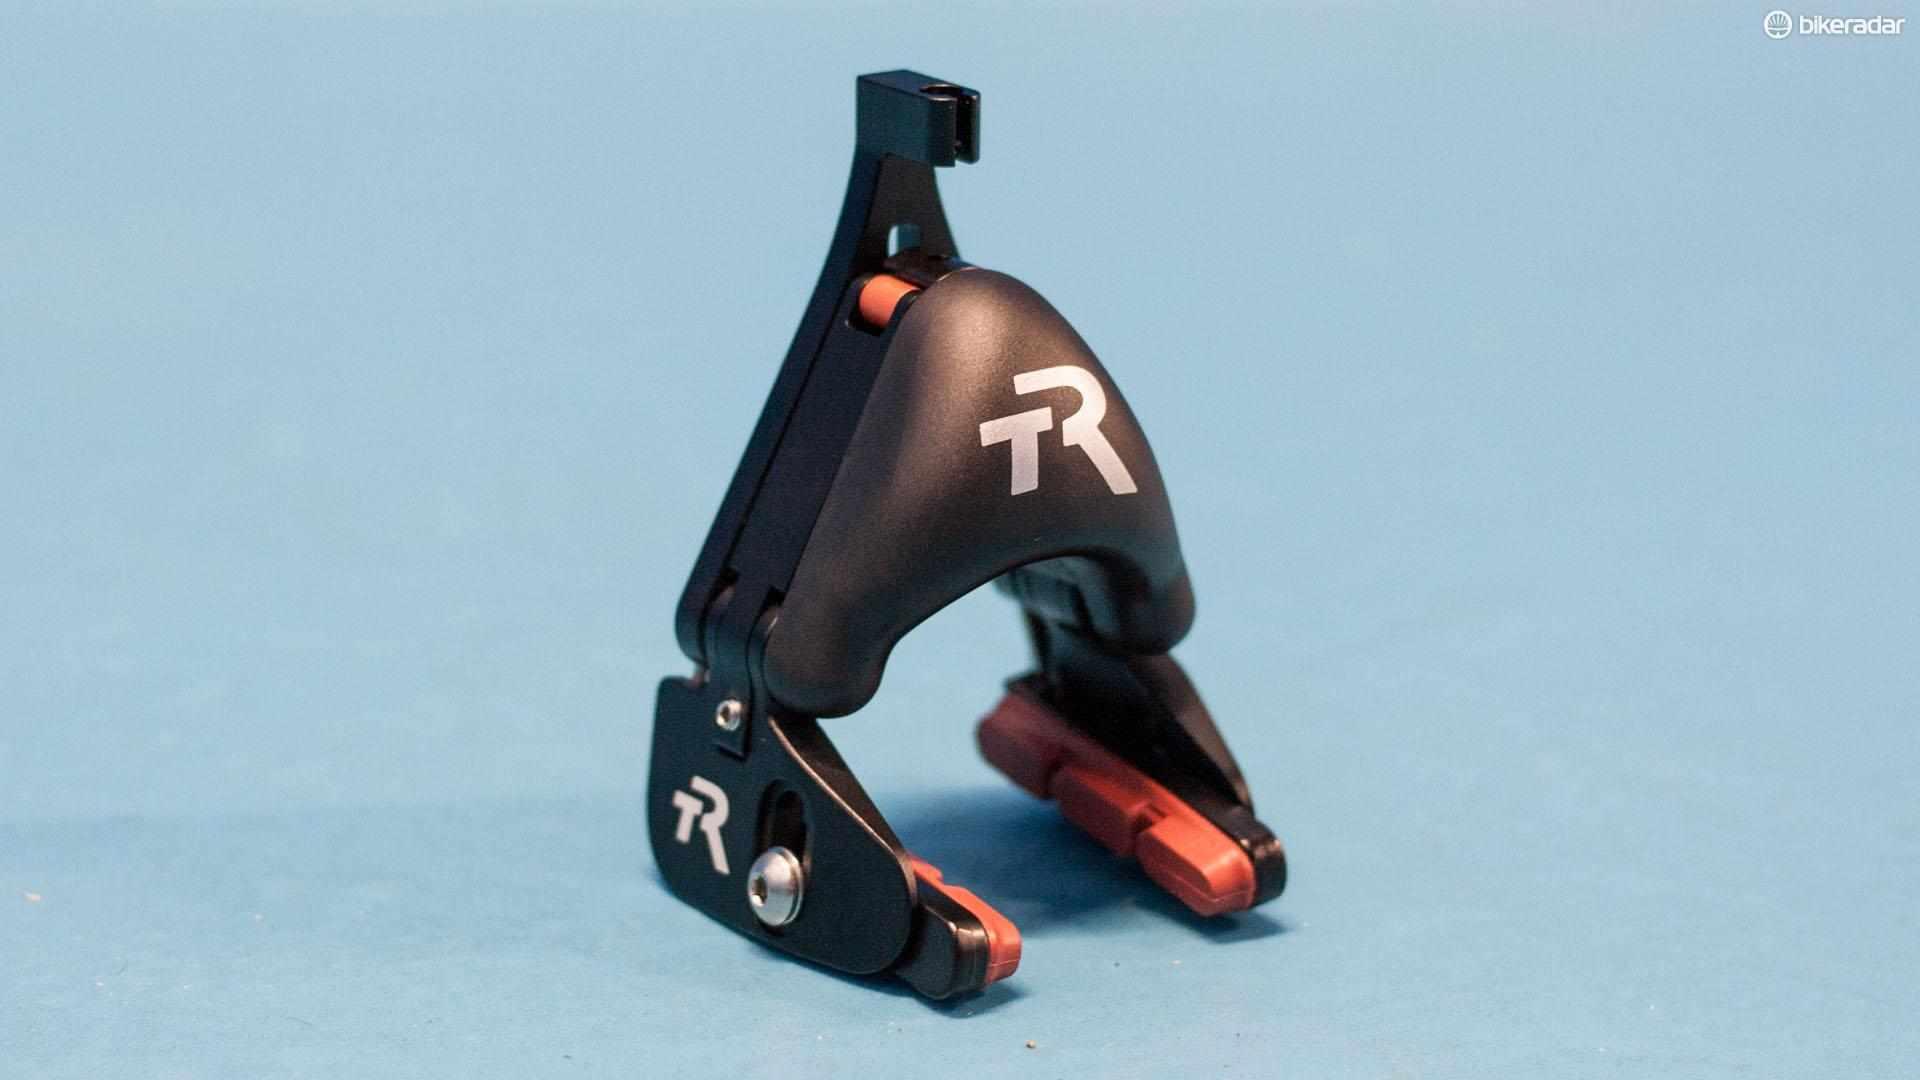 The TriRig Omega X TT front brake